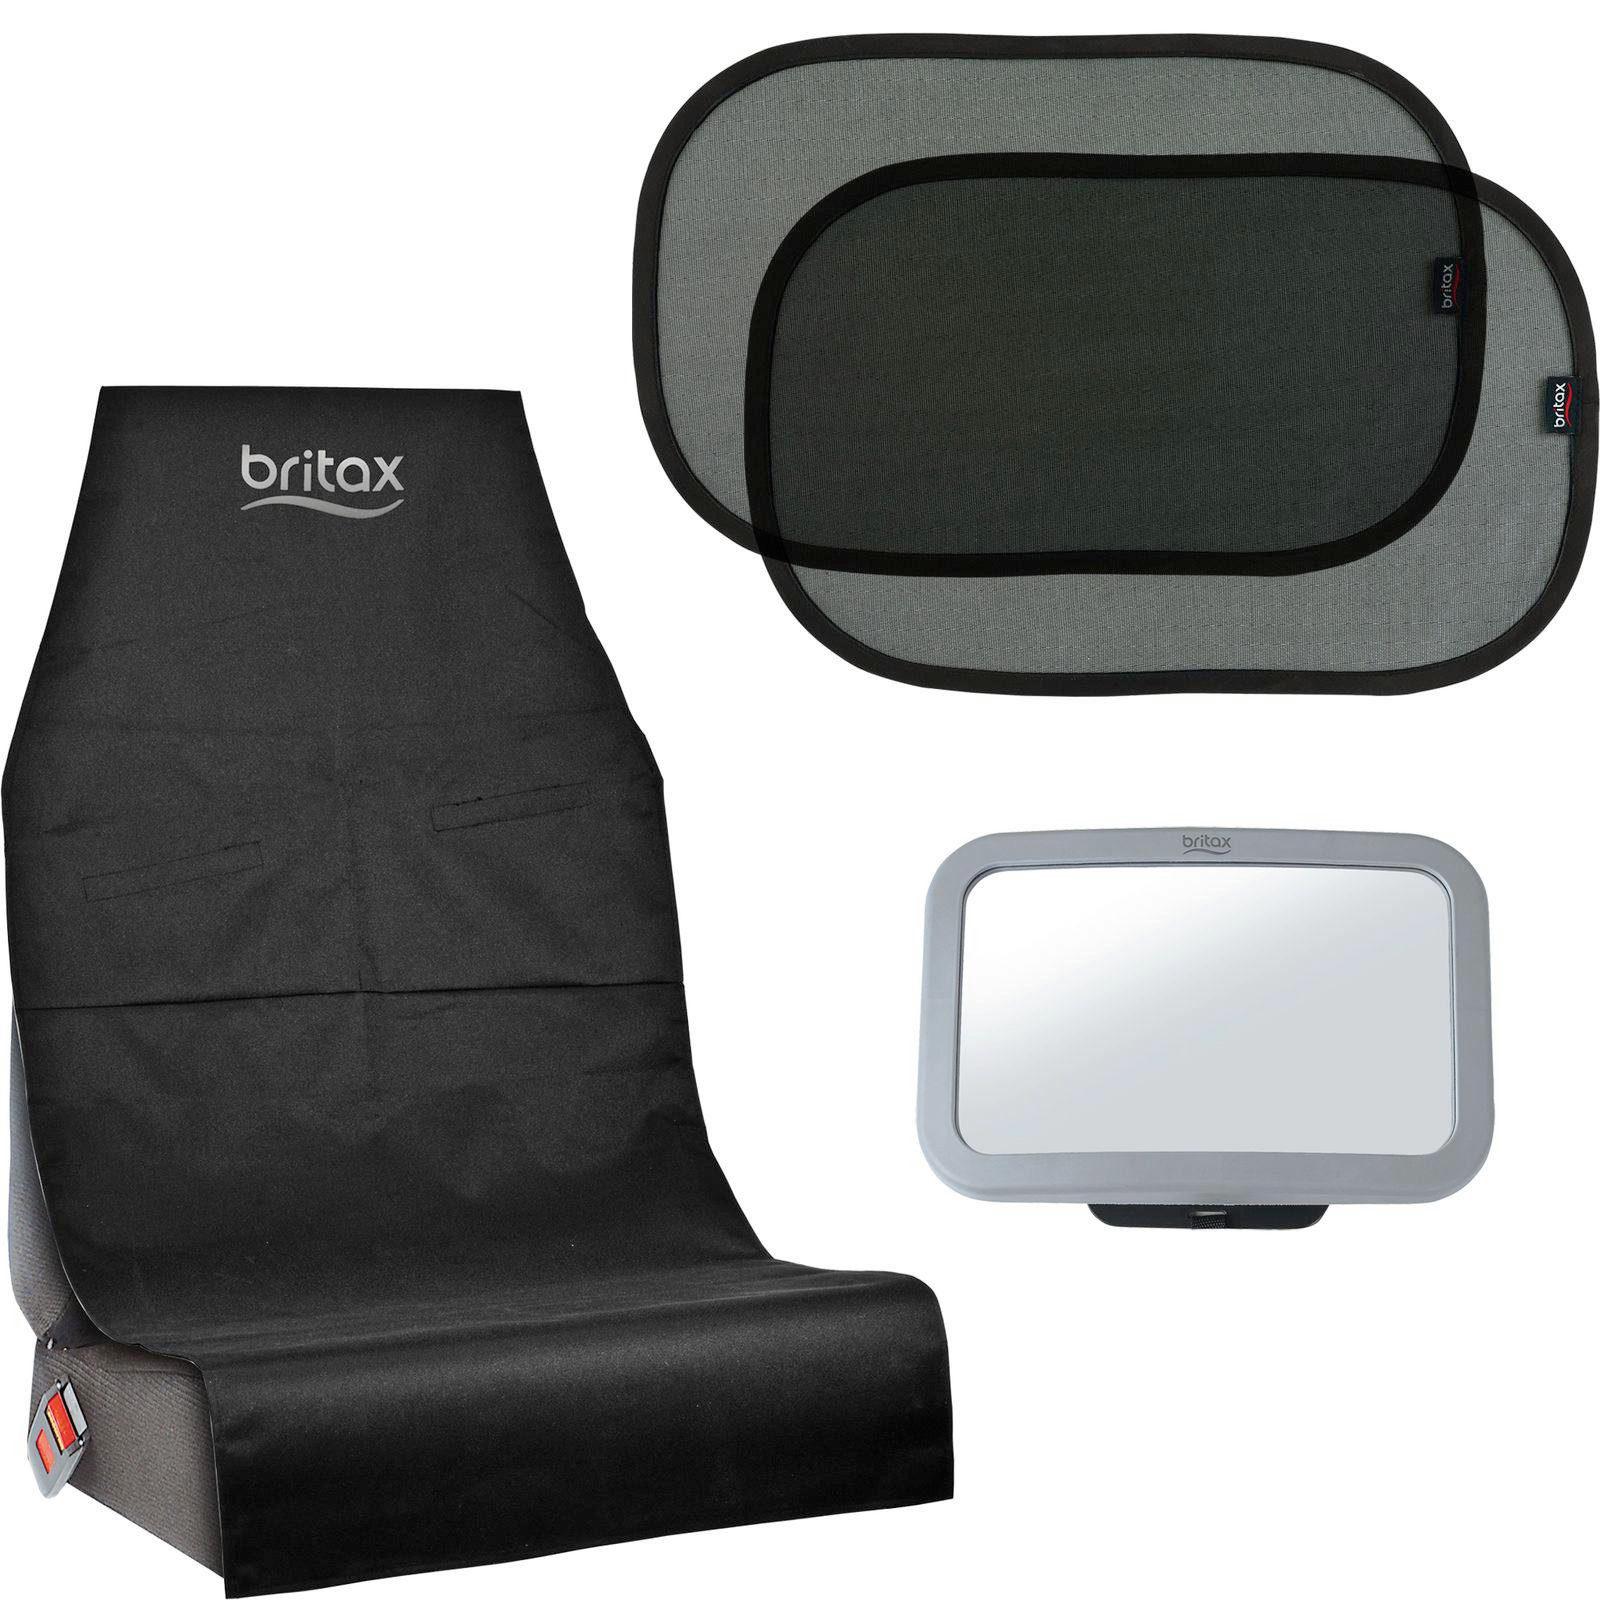 BRITAX 3-SET TILLBEHÖR BILSTOL - svart/transparent, Basics, metall/plast (1.5kg) - Römer